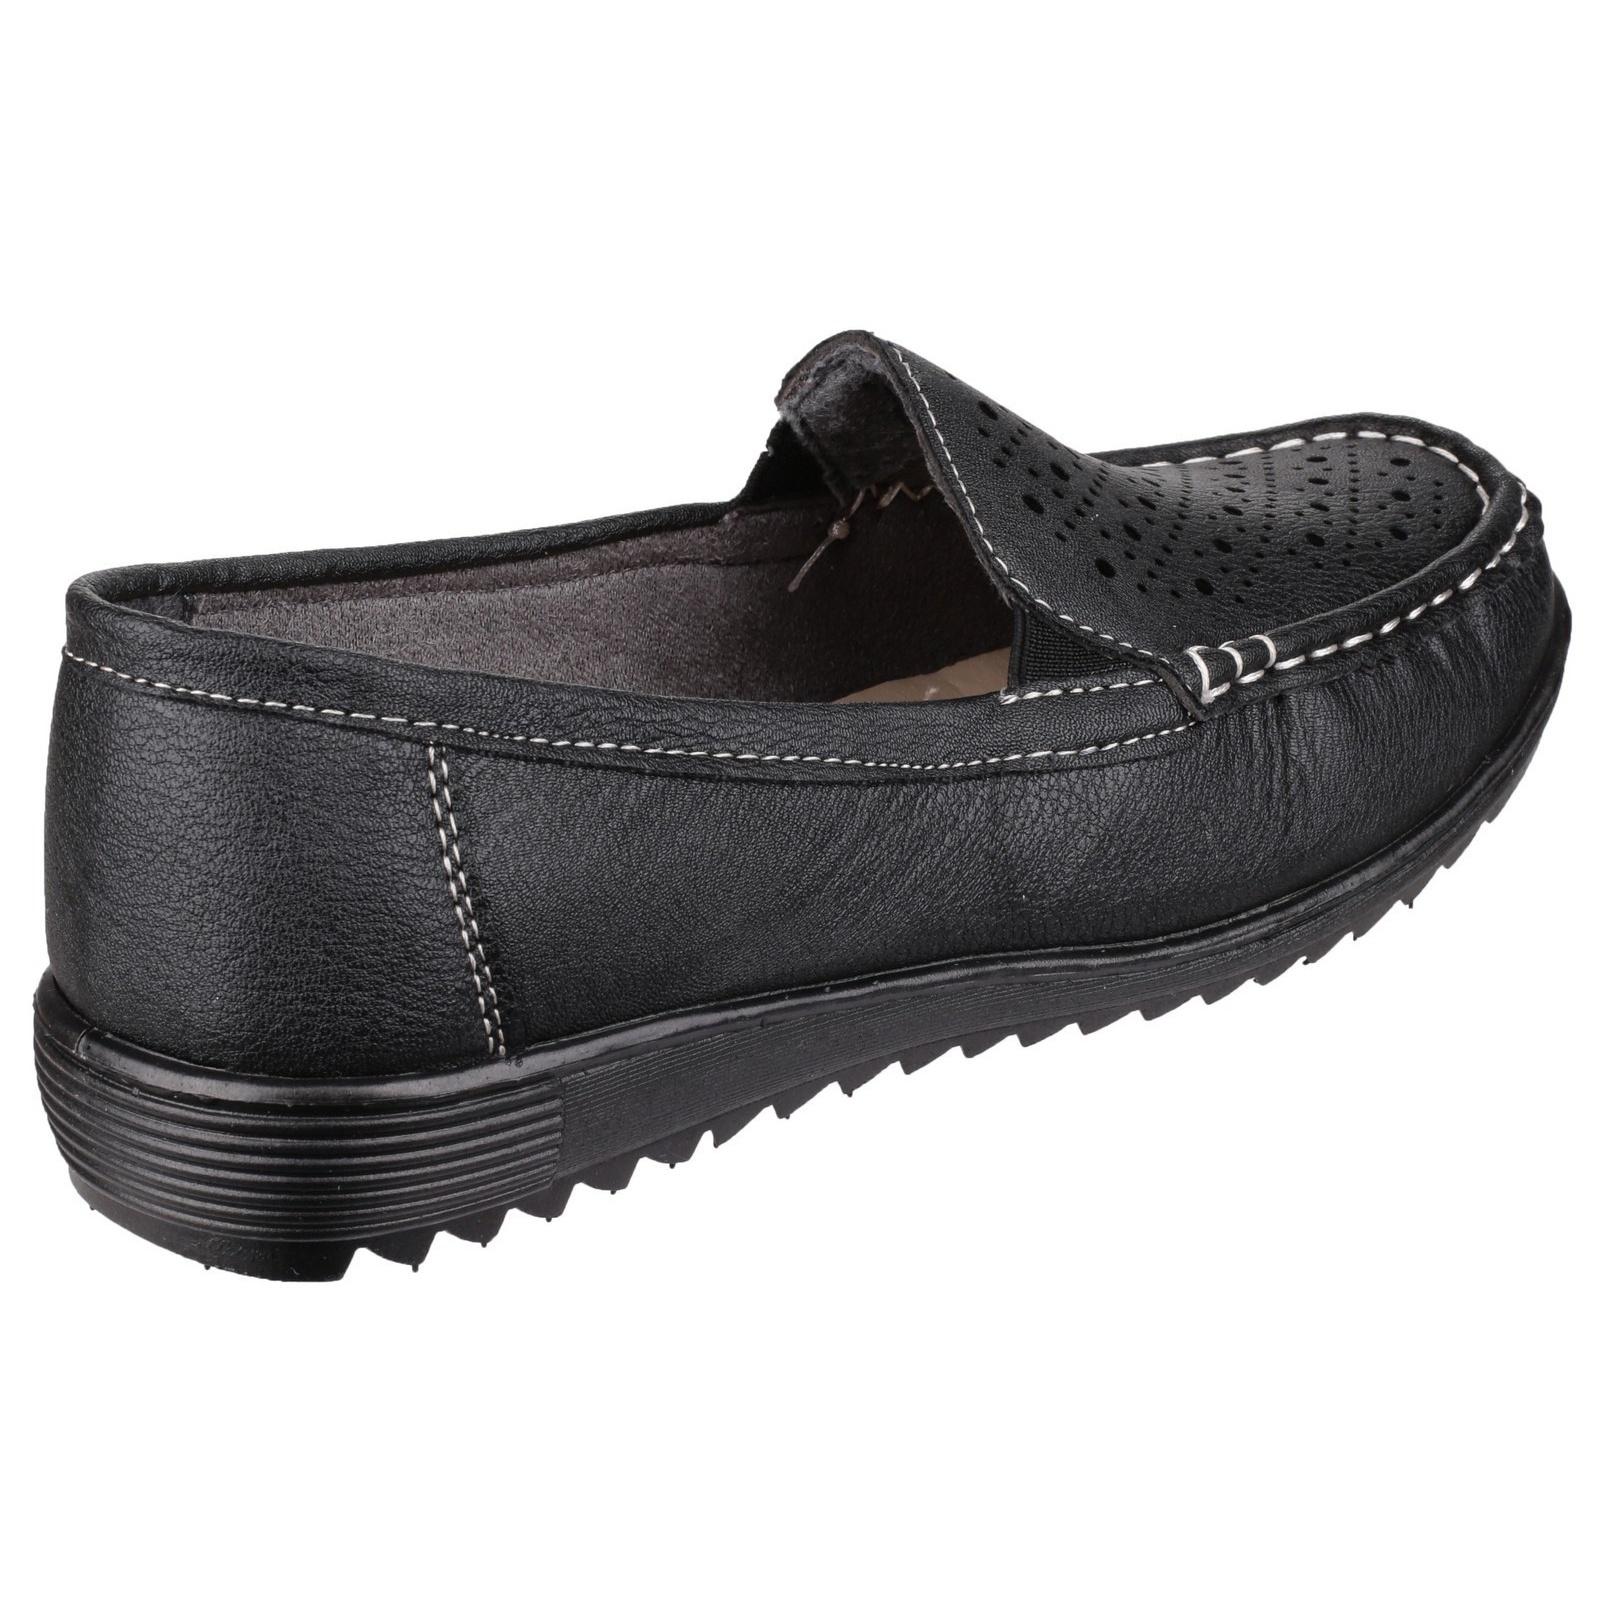 Amblers Cherwell Mujer/Dama Ligero Verano Zapatos Mocasín